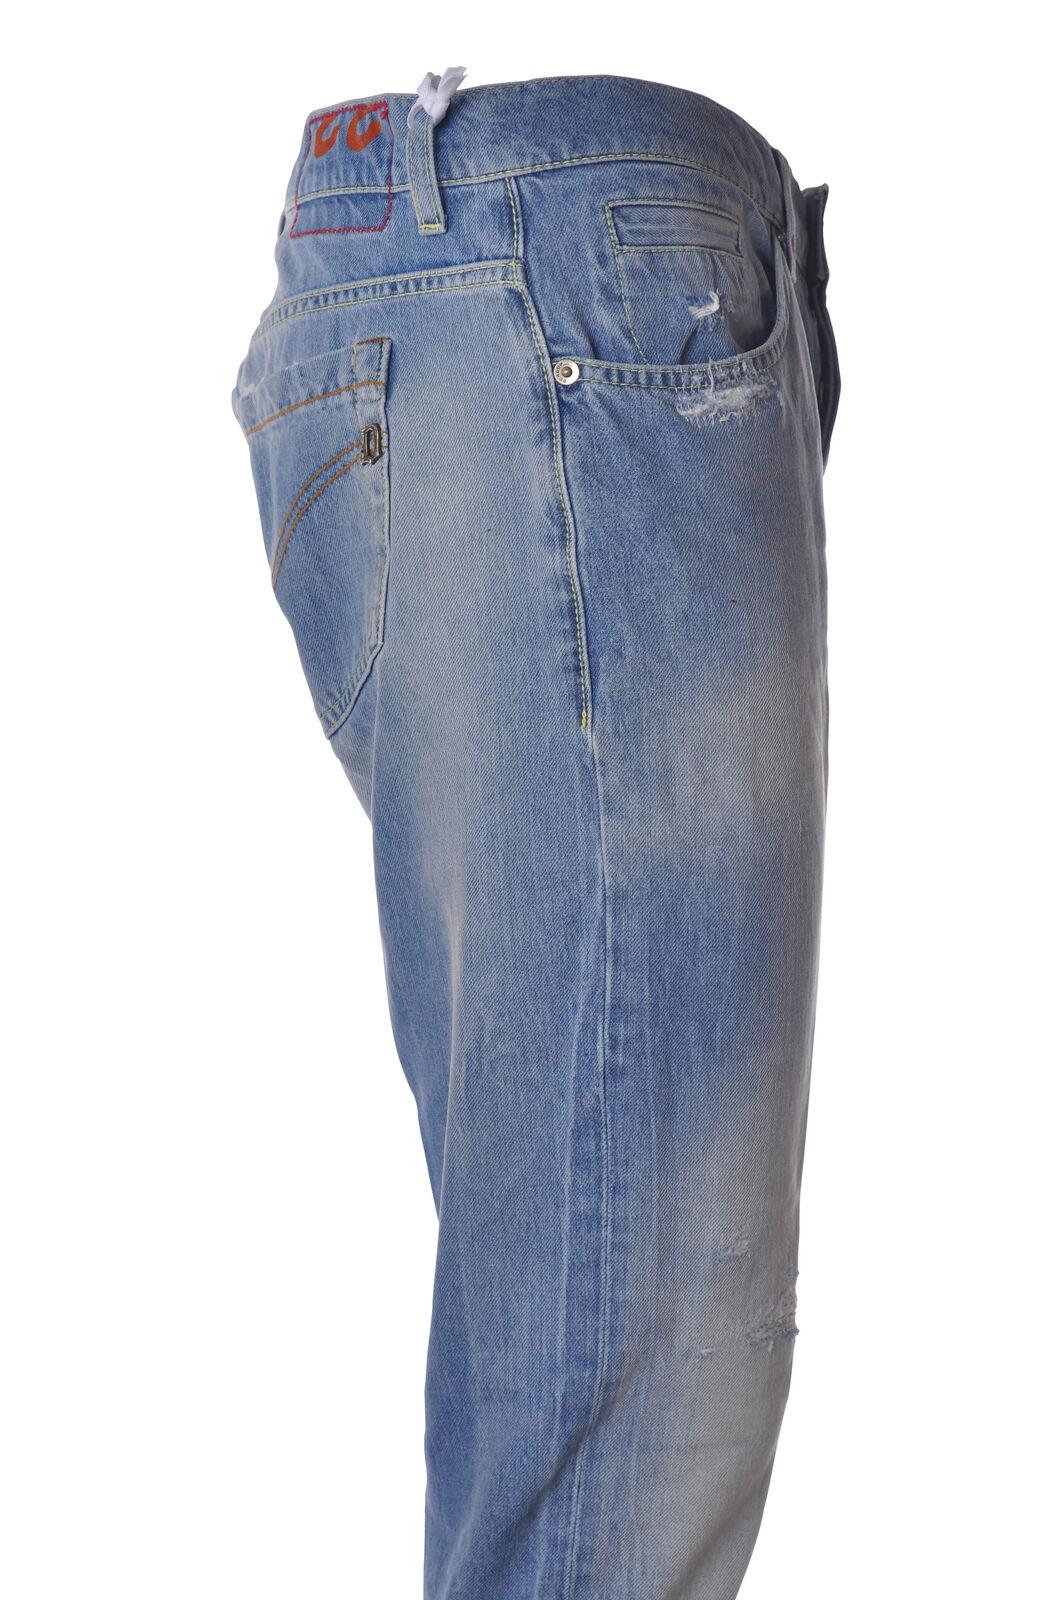 Dondup - Jeans-straight leg Pants - Man - Denim - 5201206C195253